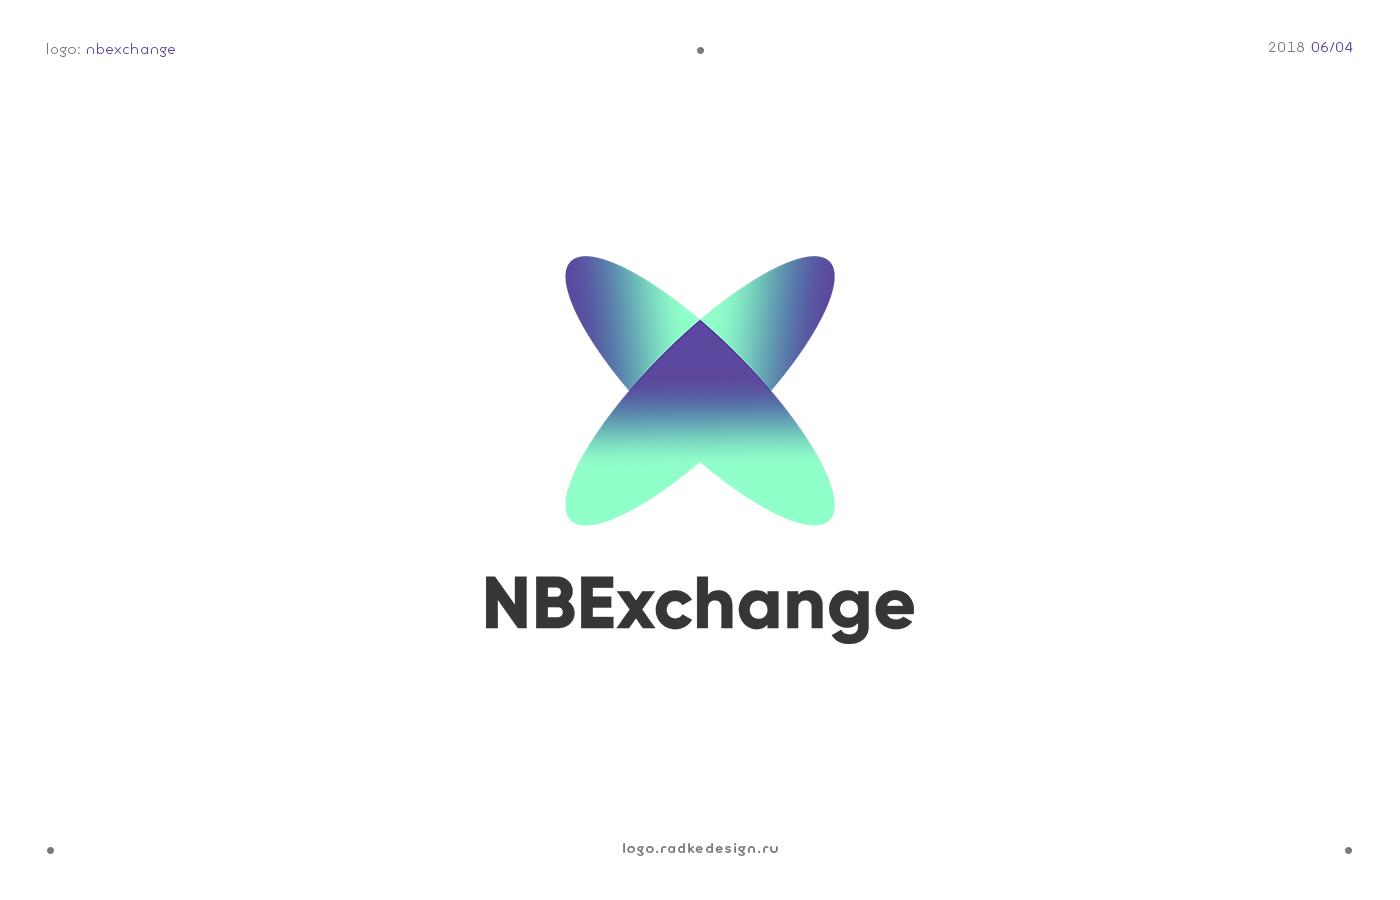 NBExchange